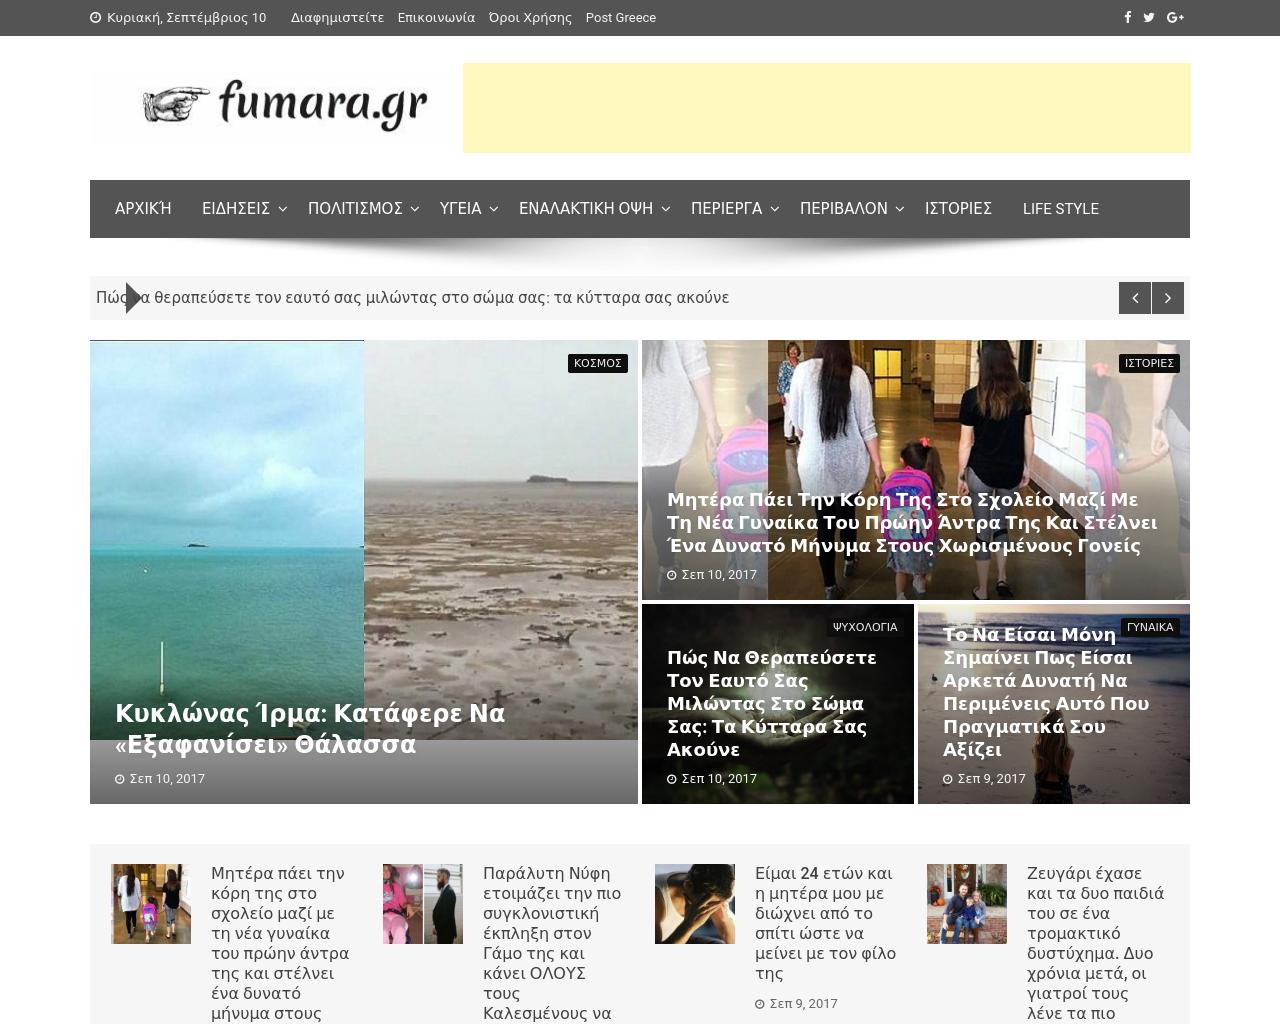 Fumara-Advertising-Reviews-Pricing